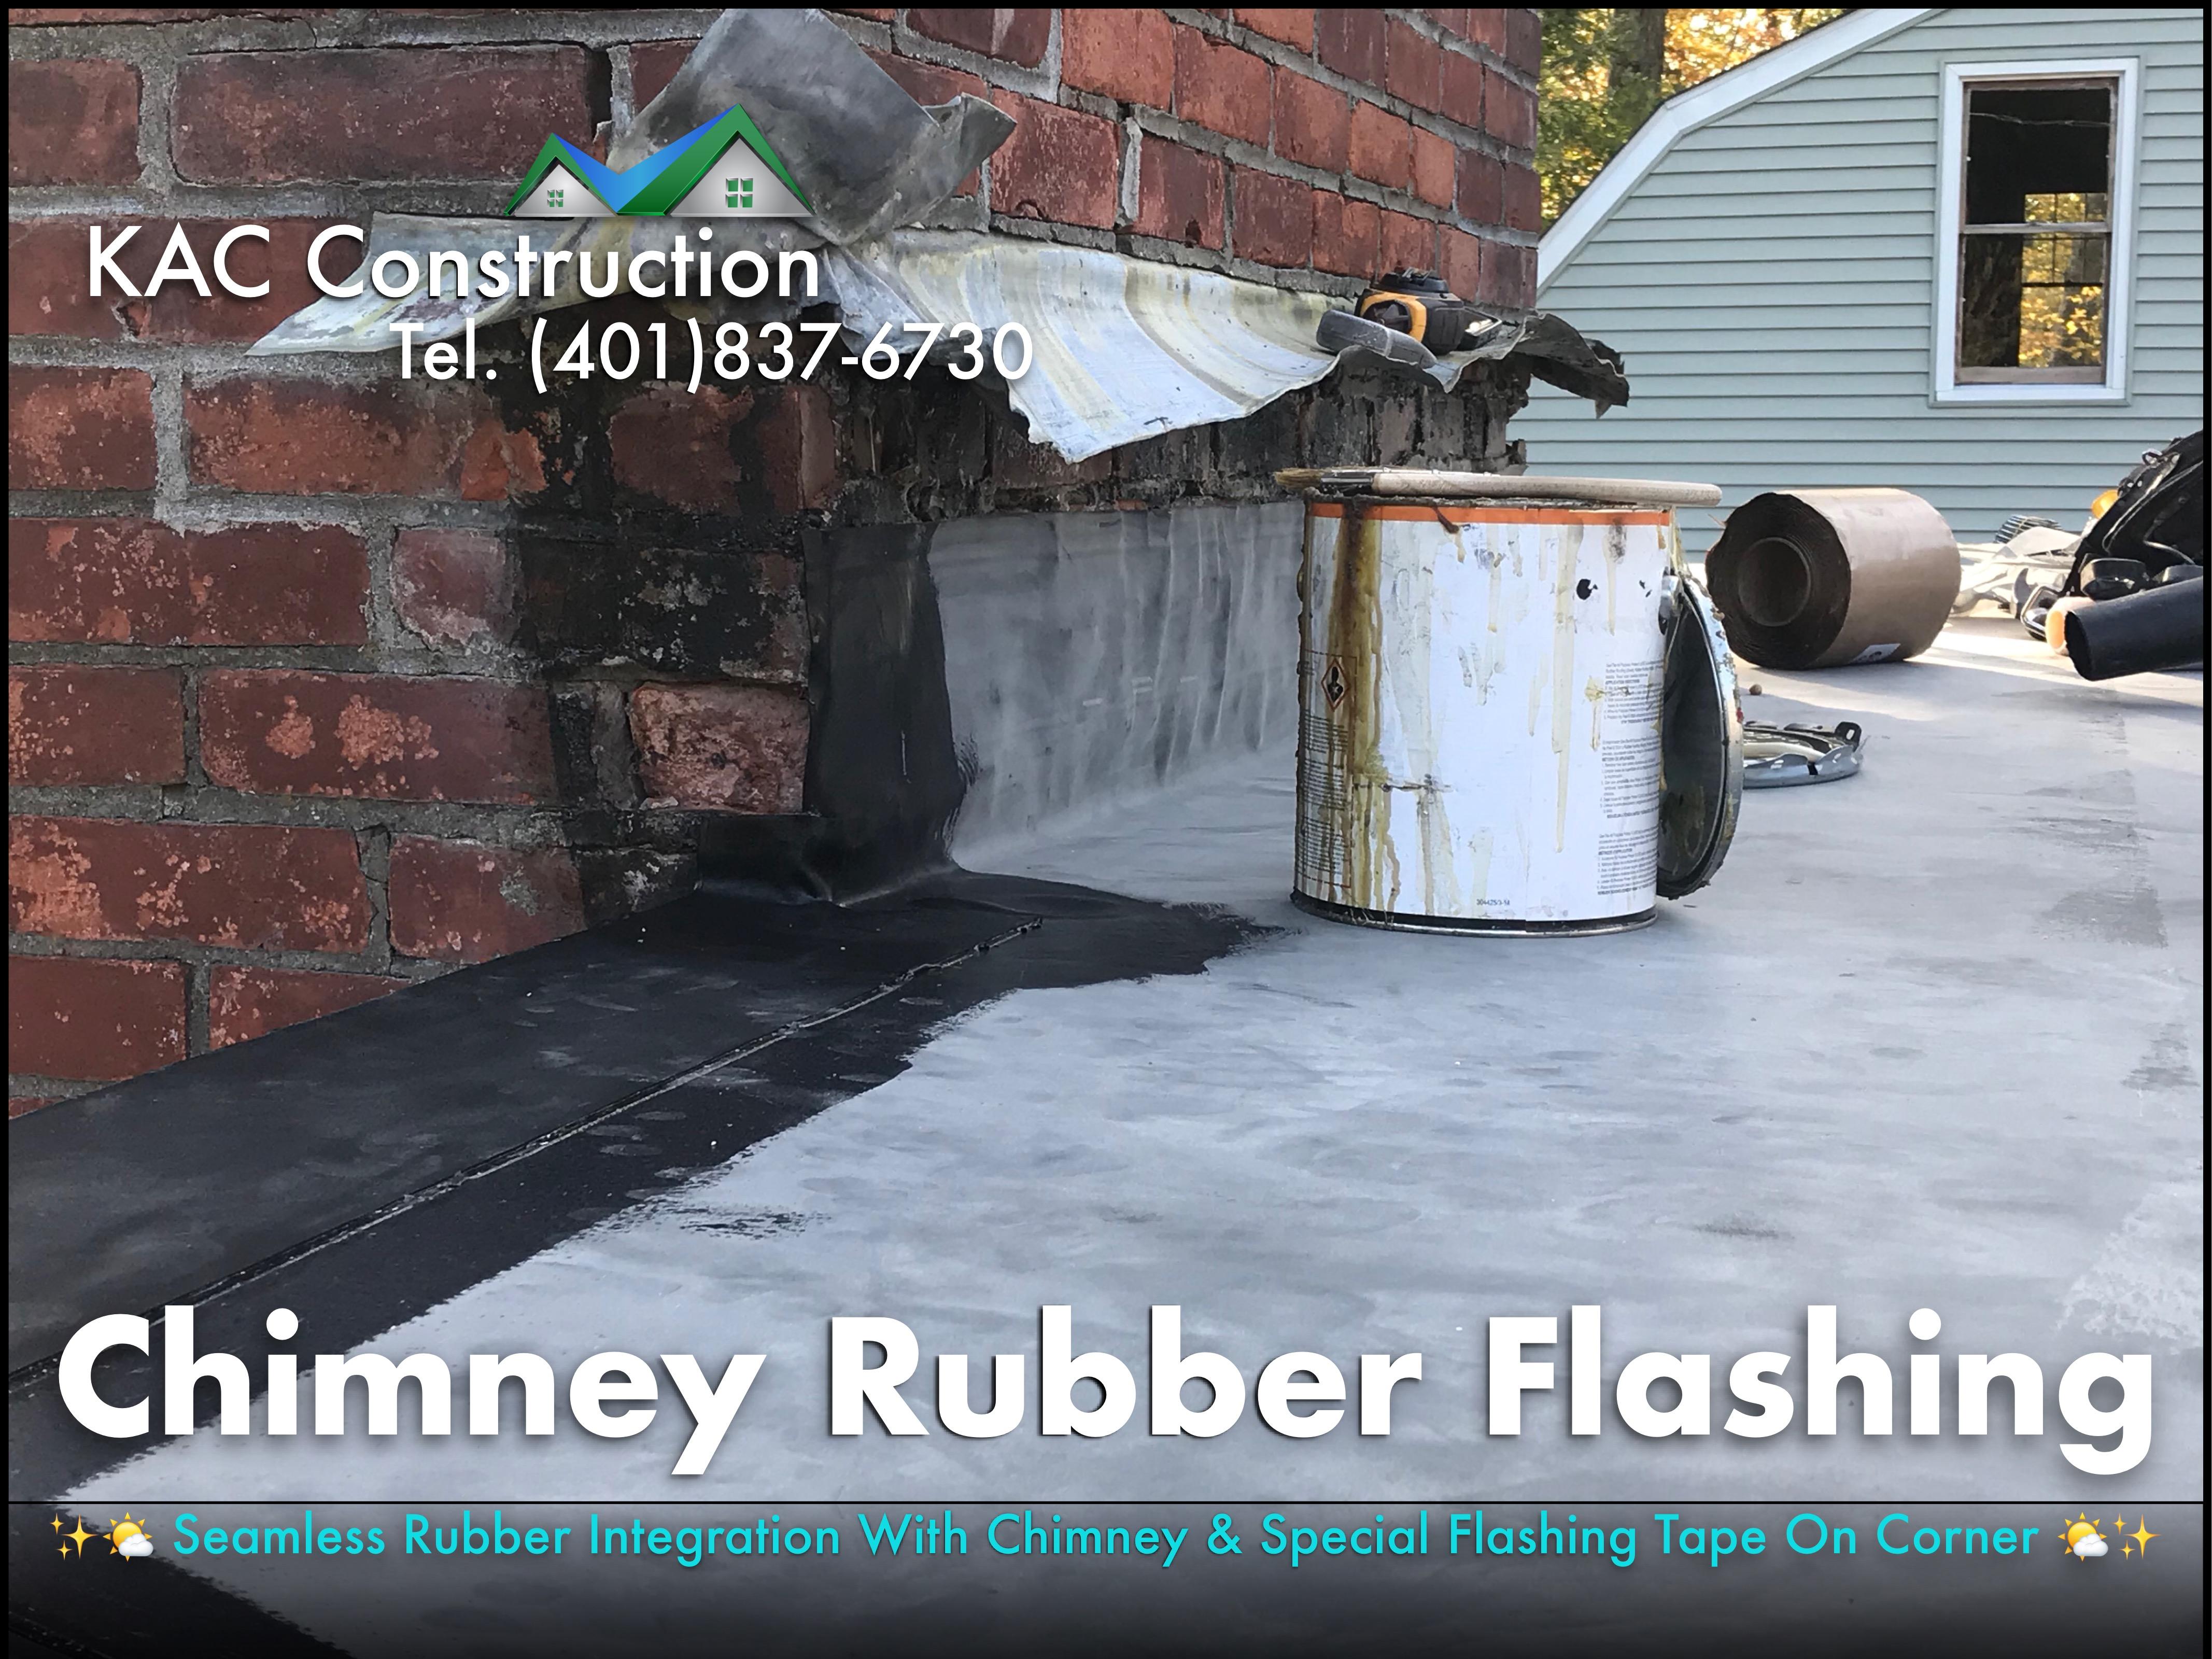 Rubber roofing, rubber roofing RI, rubber roofing in RI, best rubber roofing RI, rubber roofing contractor RI, rubber roofing contractor in RI, rubber roofing contractors RI, rubber roof Installation ri,